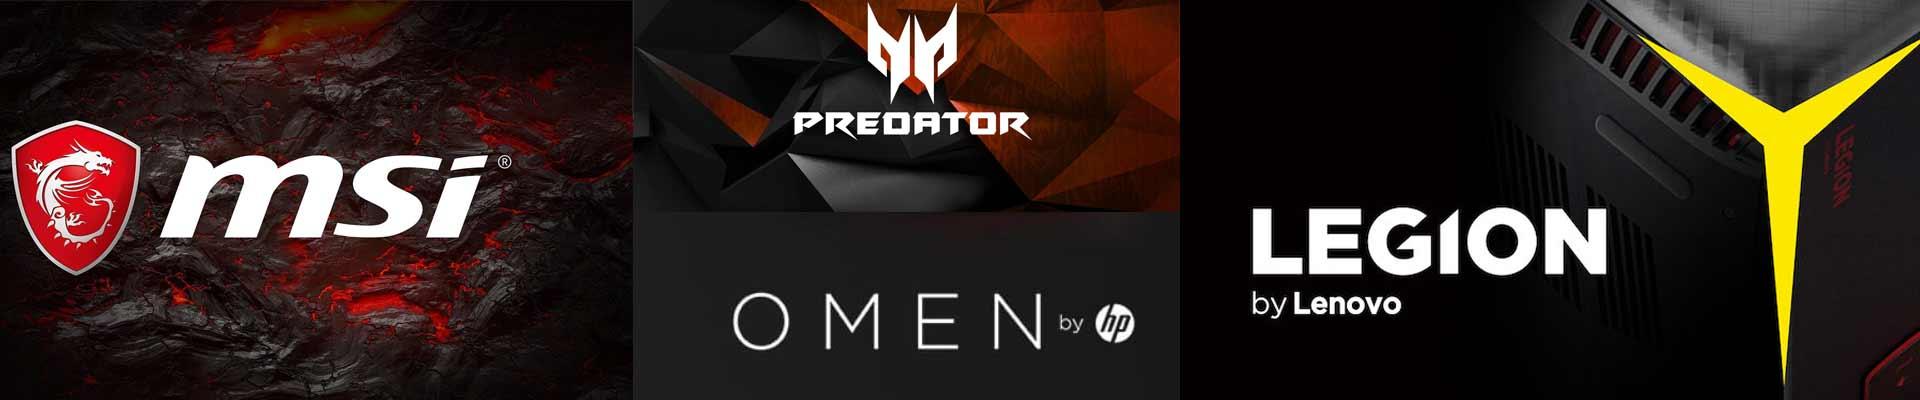 PC Gaming de Marca Comparativa comprar mejores: HP Omen, Lenovo Legion, Acer Predator, Asus Tuff